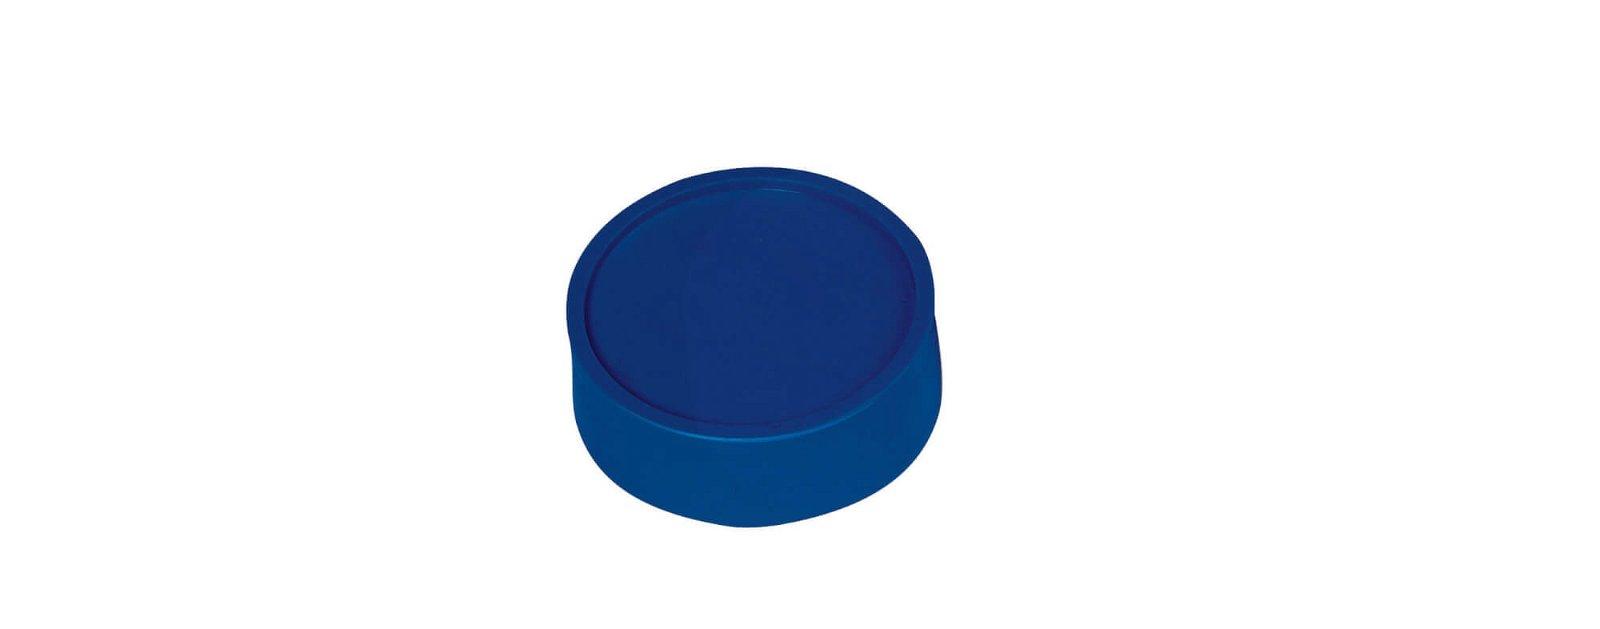 Rund-Magnet, PE Ø 34 mm, 2 kg Haftkraft, 10 St./Set, blau